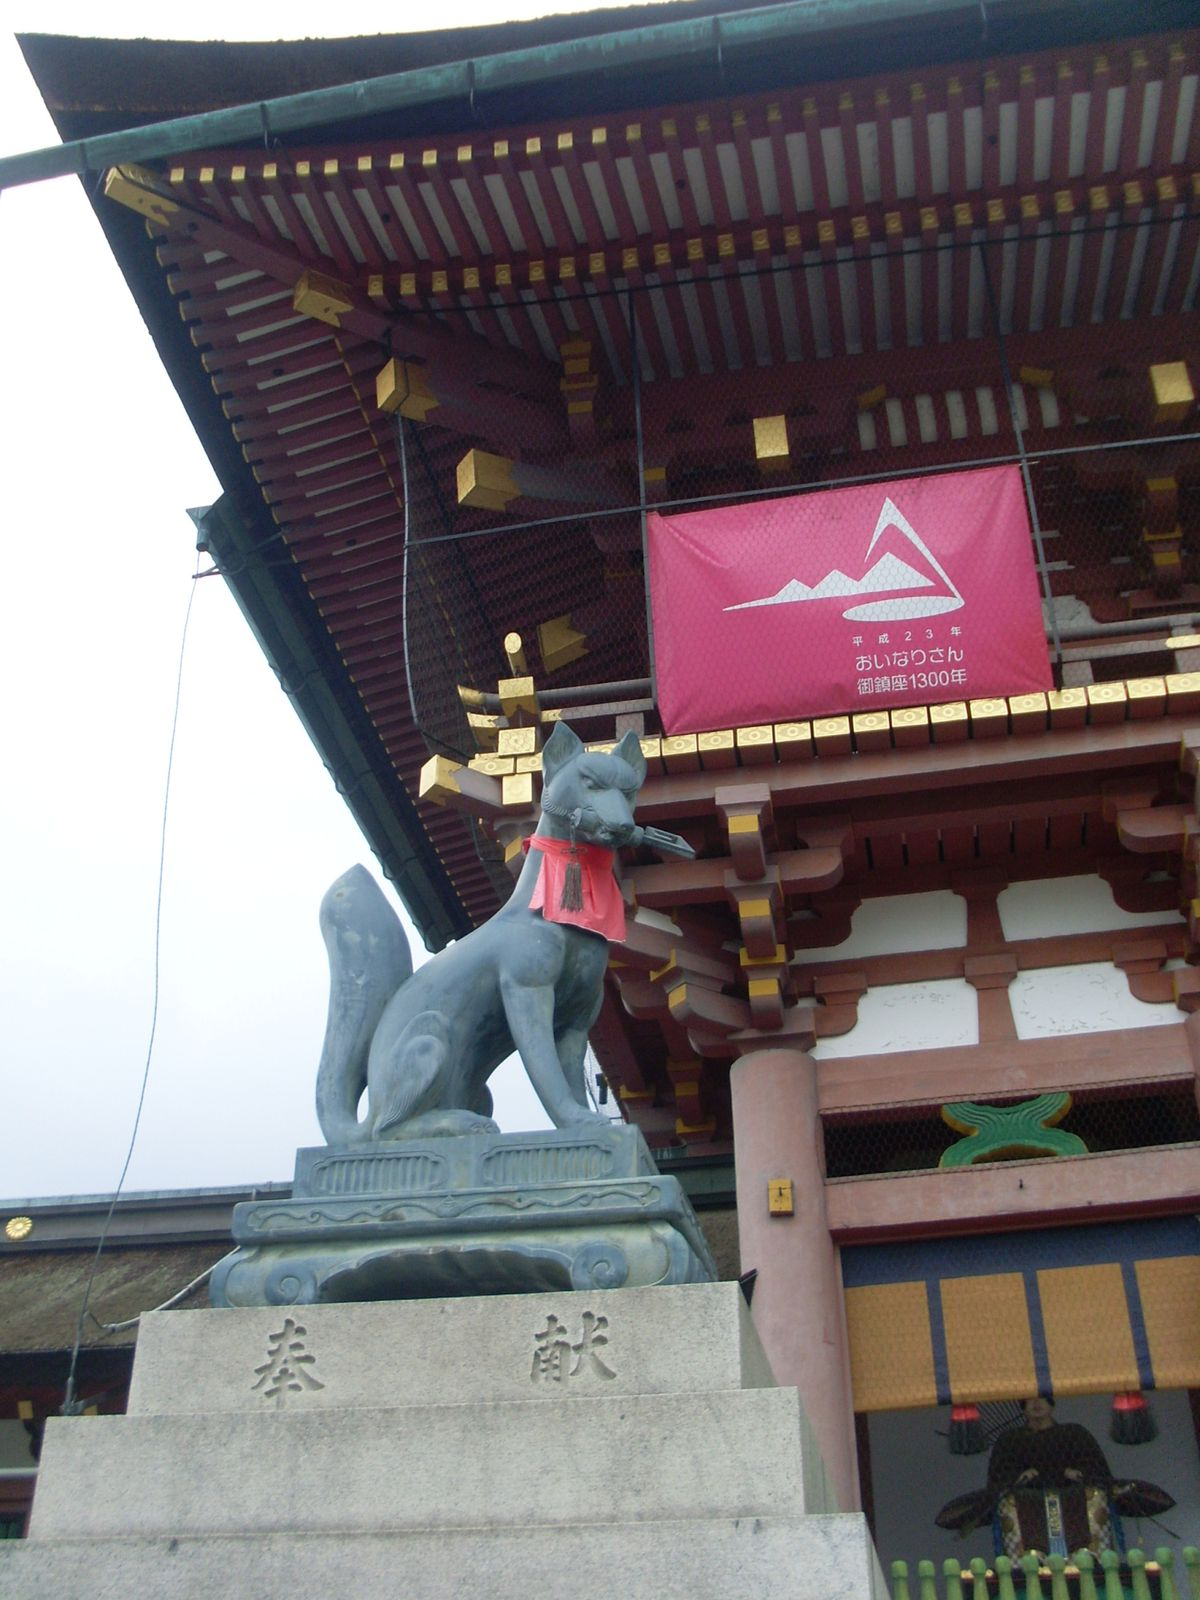 Quelques photos du Japon (5) : Fushimi Inari